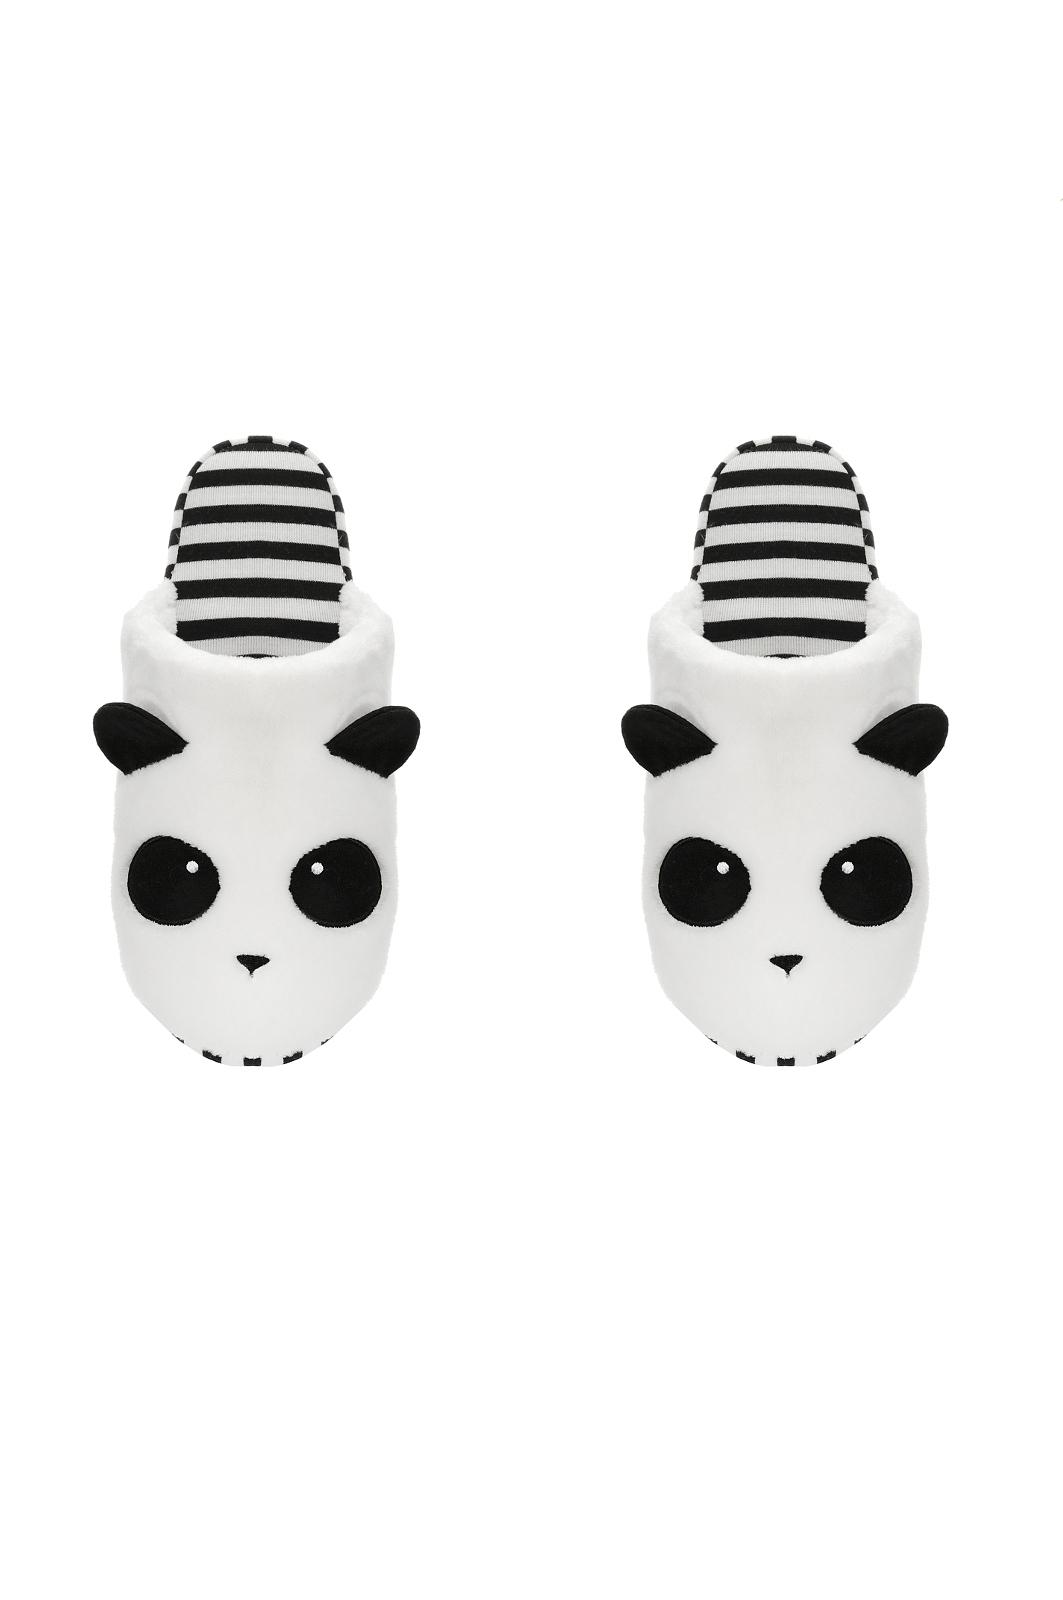 Dámské papuče 36170 Panda - Henderson Ladies - Bila s cernou/39/40